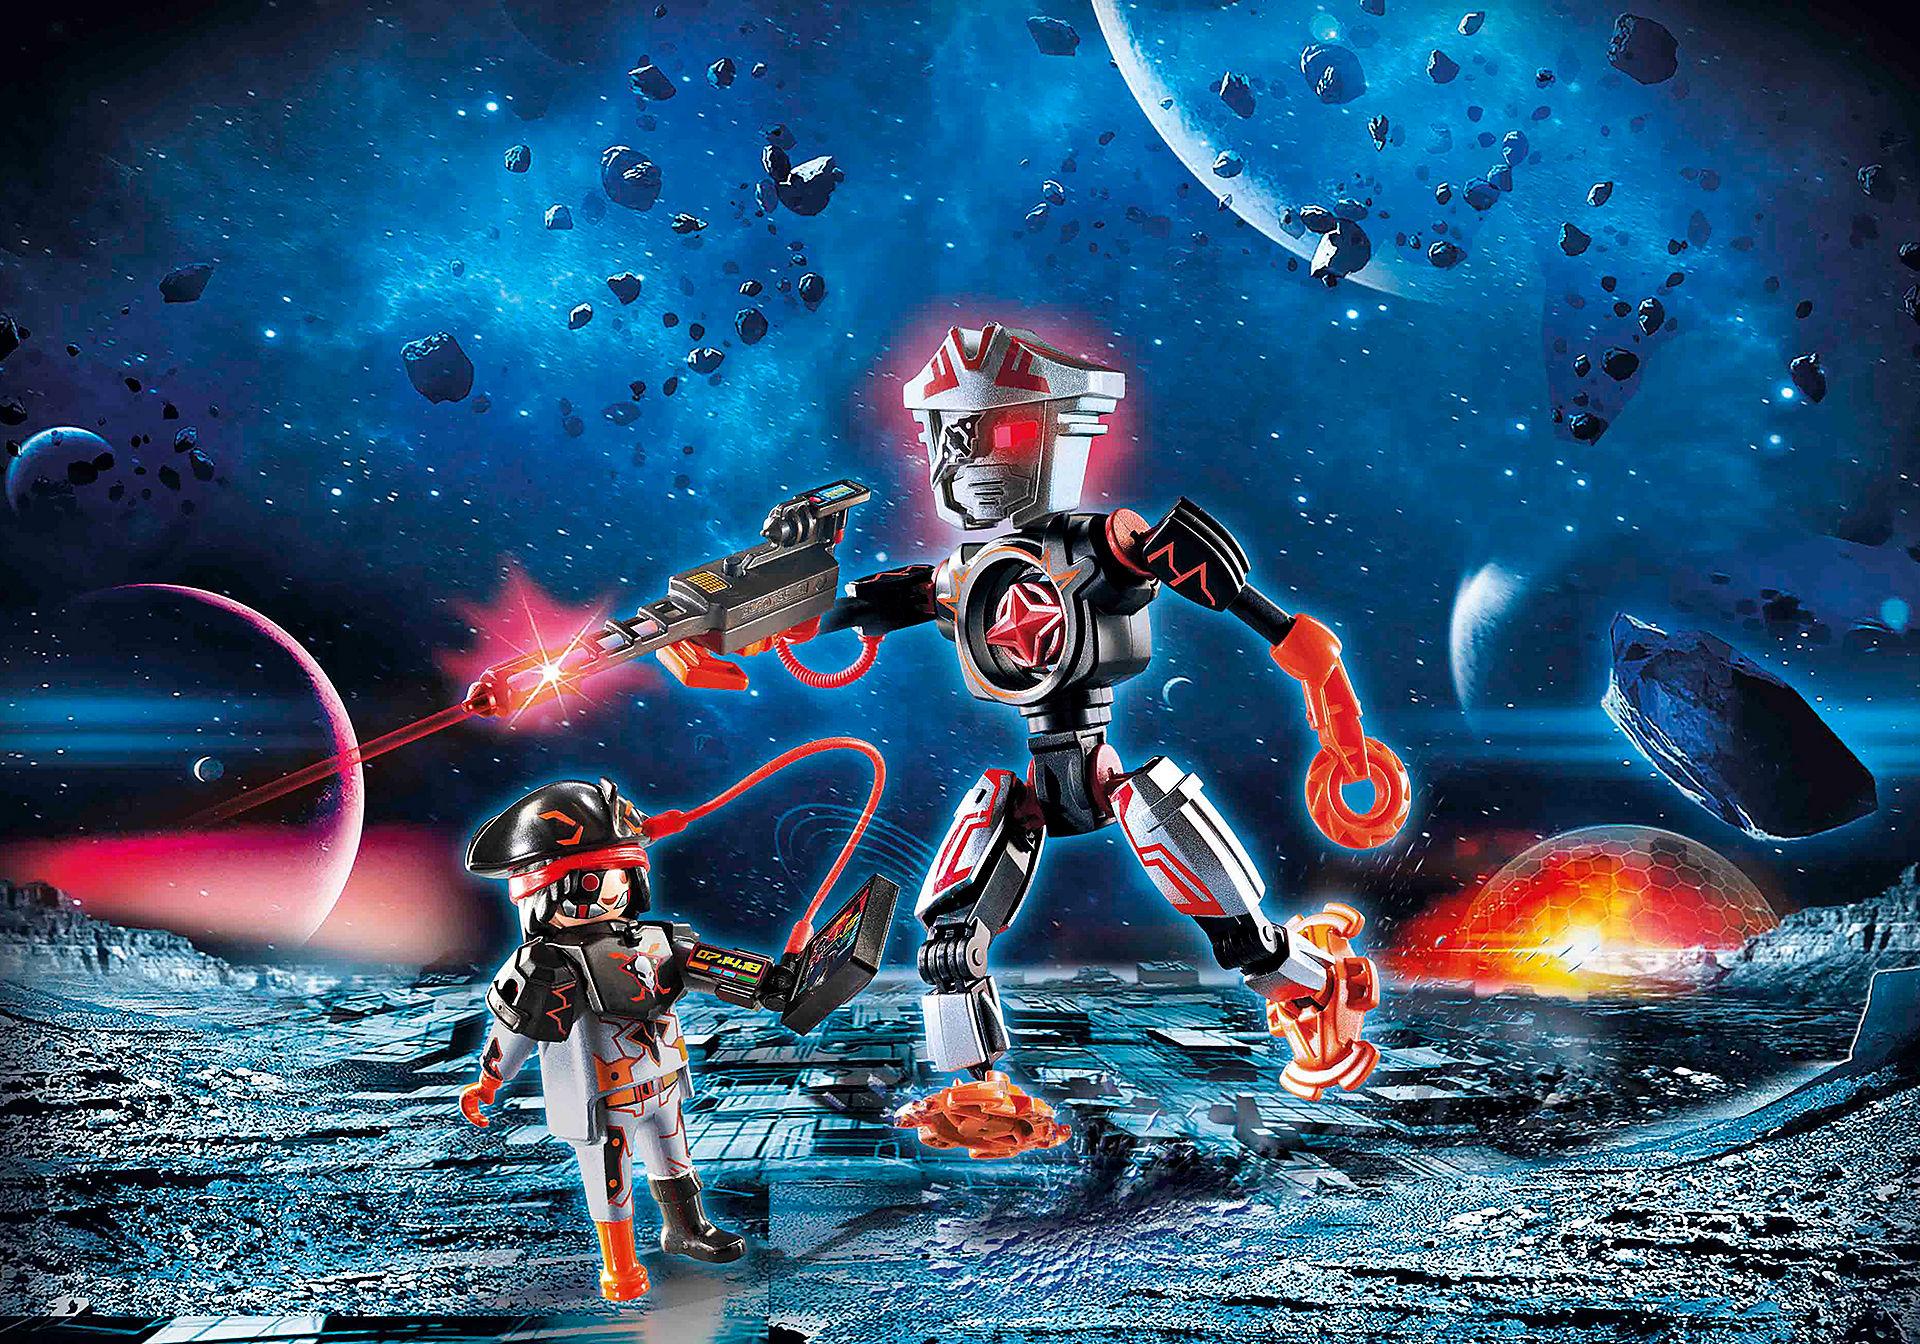 70024 Űrkalózok - Robot zoom image1